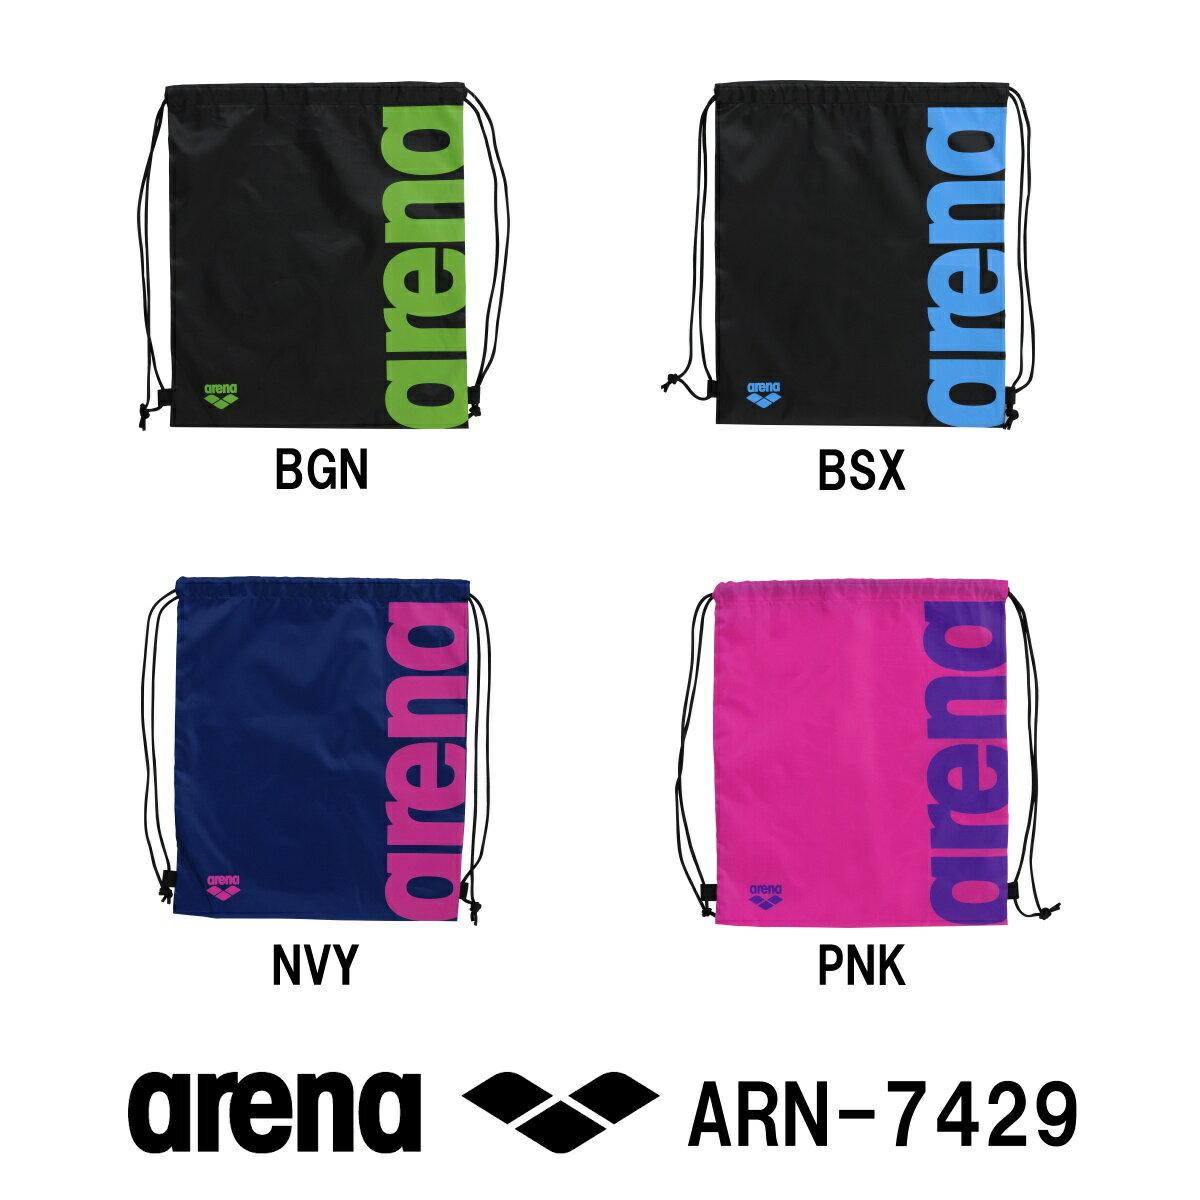 ARENA アリーナ マルチバッグ(L) ARN-7429